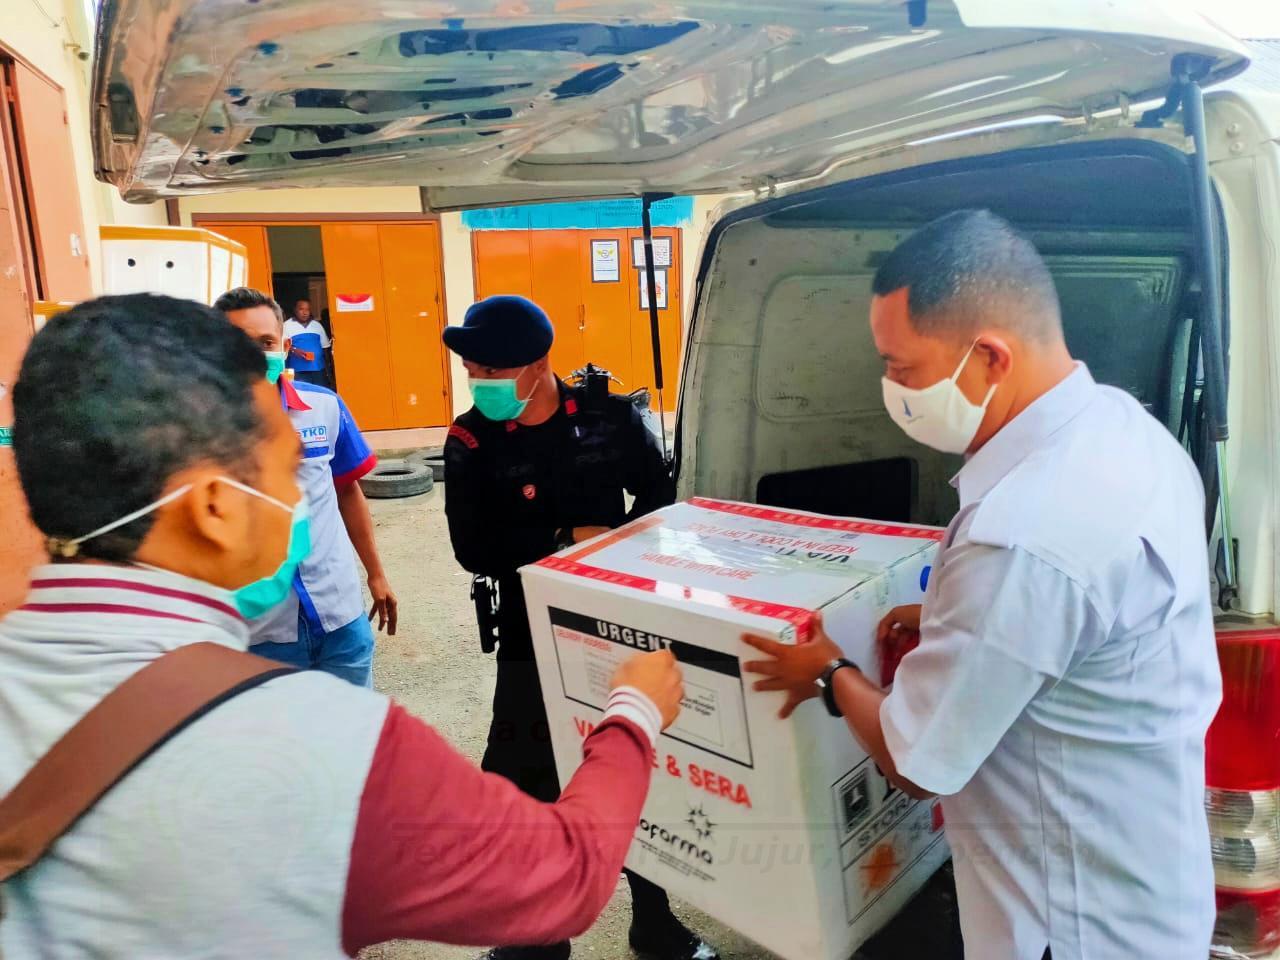 Tiba di Kota Sorong 2.600 Vaksin Sinovac Dikawal Langsung Batalyon B Pelopor dan Subden 2 Gegana 1 IMG 20210114 163600